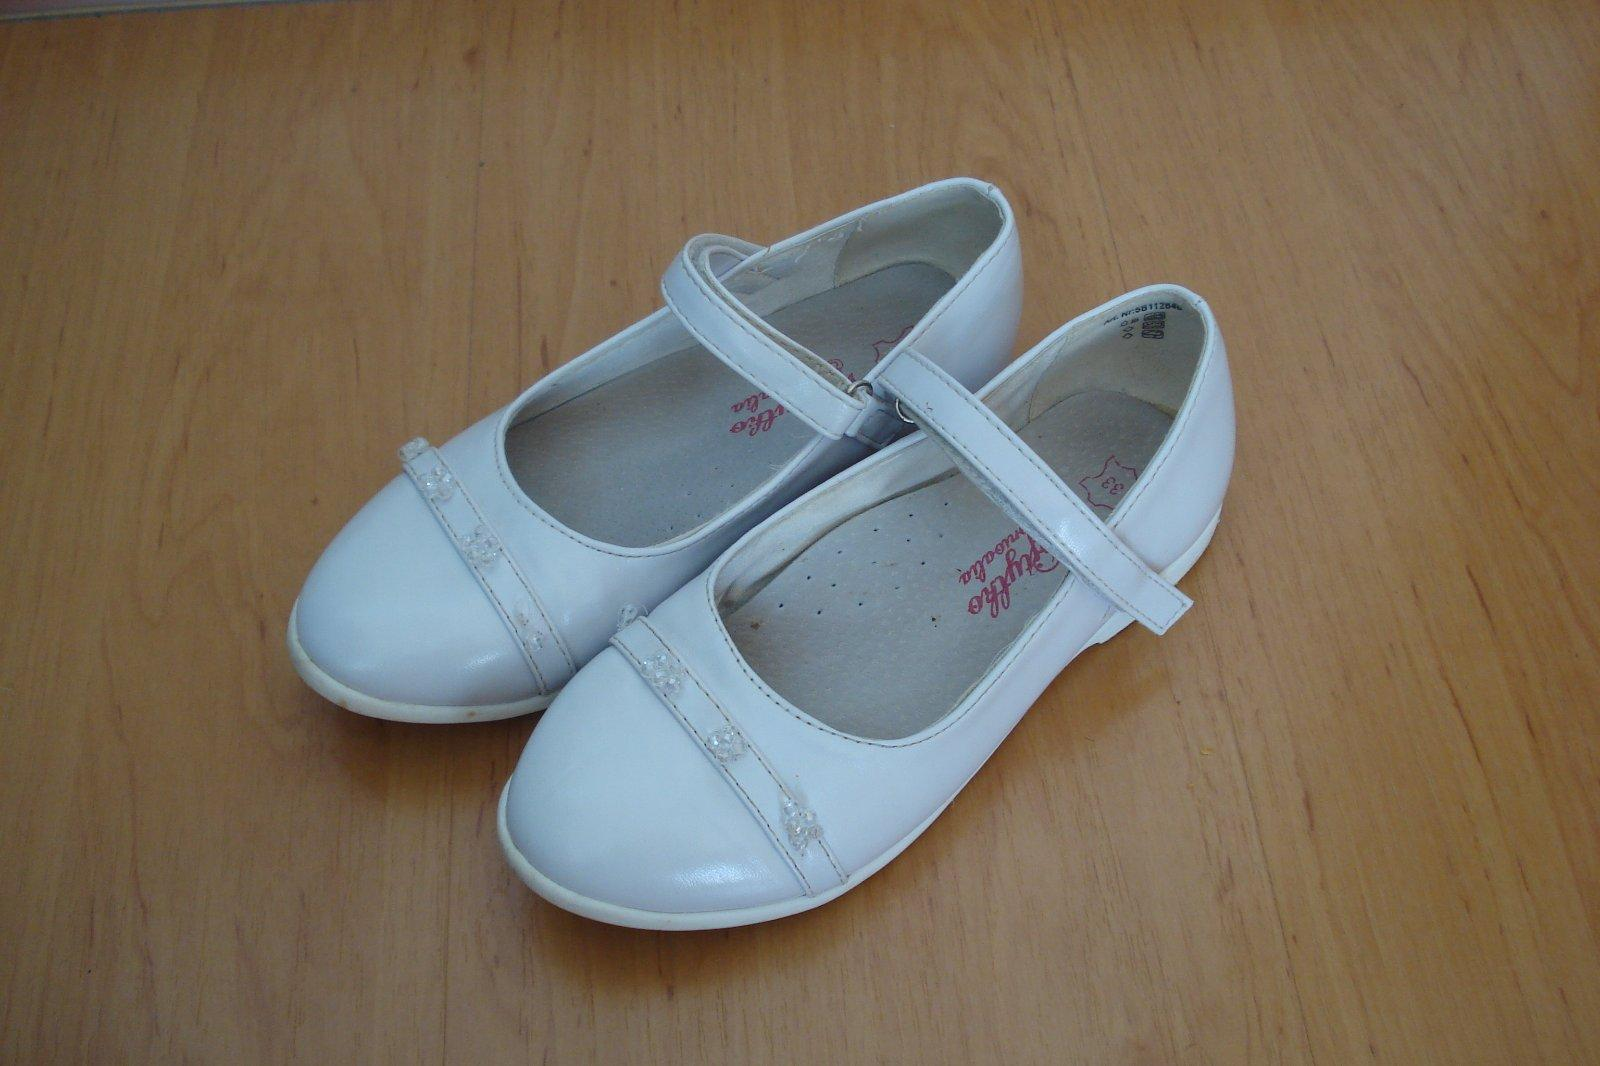 9b048bd101 Biele uzatvorené sandálky